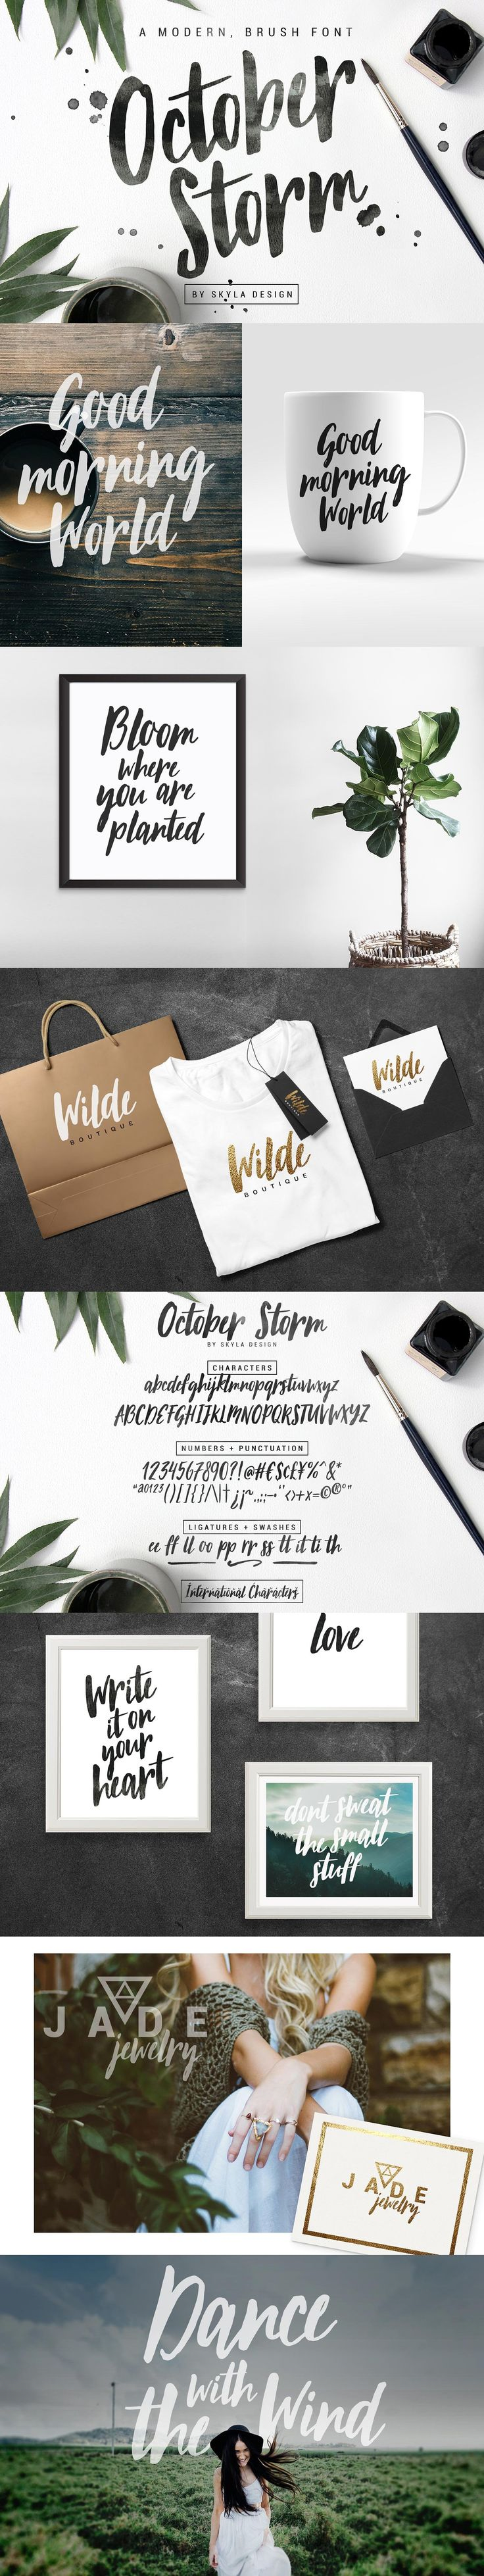 Modern brush font - October Storm by Skyla Design on @creativemarket #fonts #font #script #brush #handwritten #download #type #graphic #design #print #cursive #calligraphy #vintage #typography #modern #digital #handwriting #handlettered #handlettering #typedesign #typeface #artoftype #handmadefont #brushtype